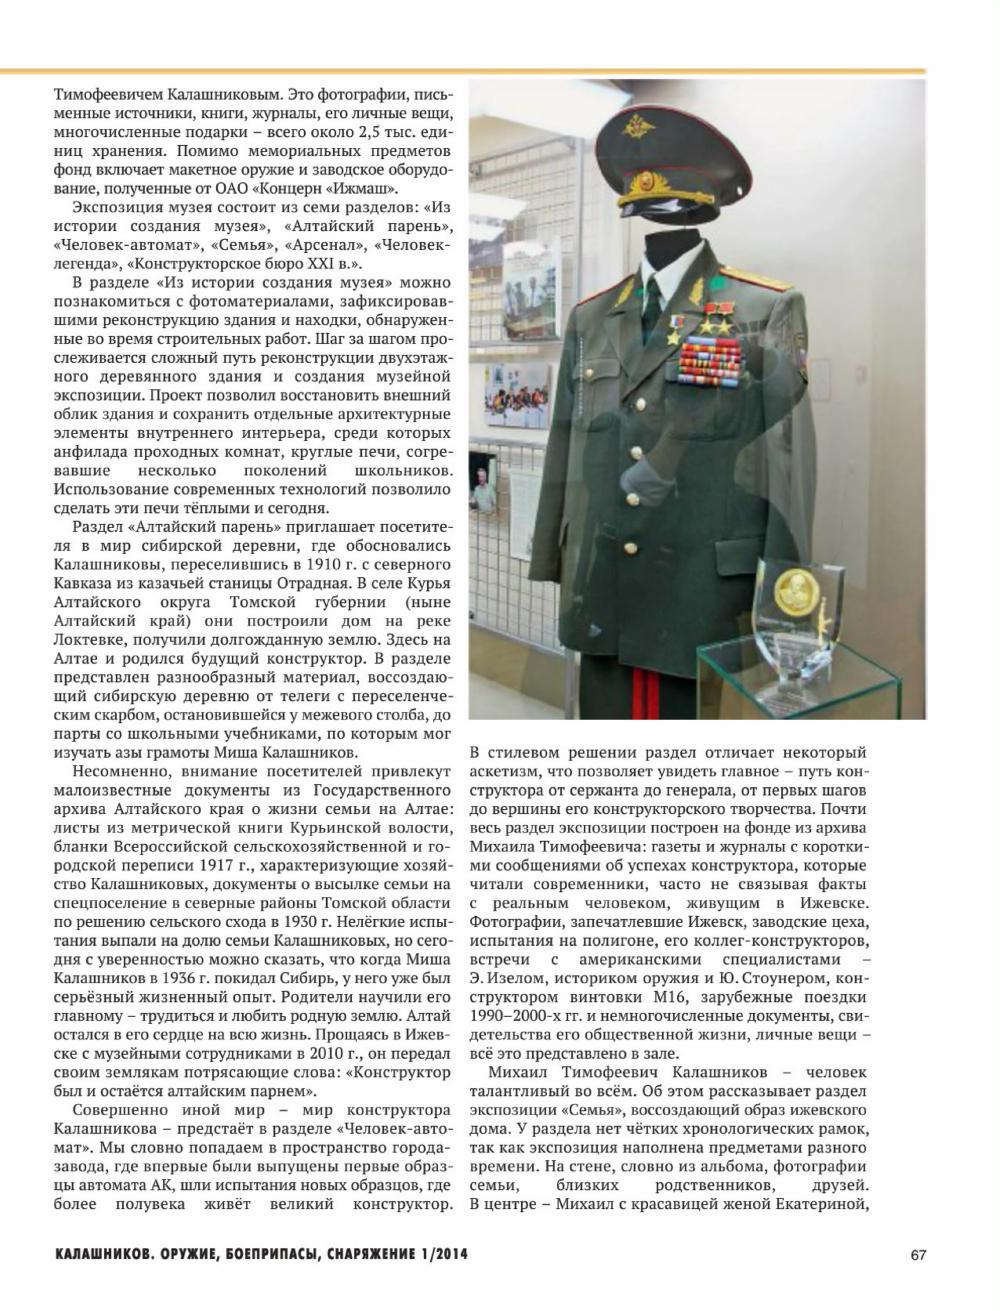 http://i3.imageban.ru/out/2013/12/27/06b7cc3a1ab8ade08edf65ce905ef454.jpg